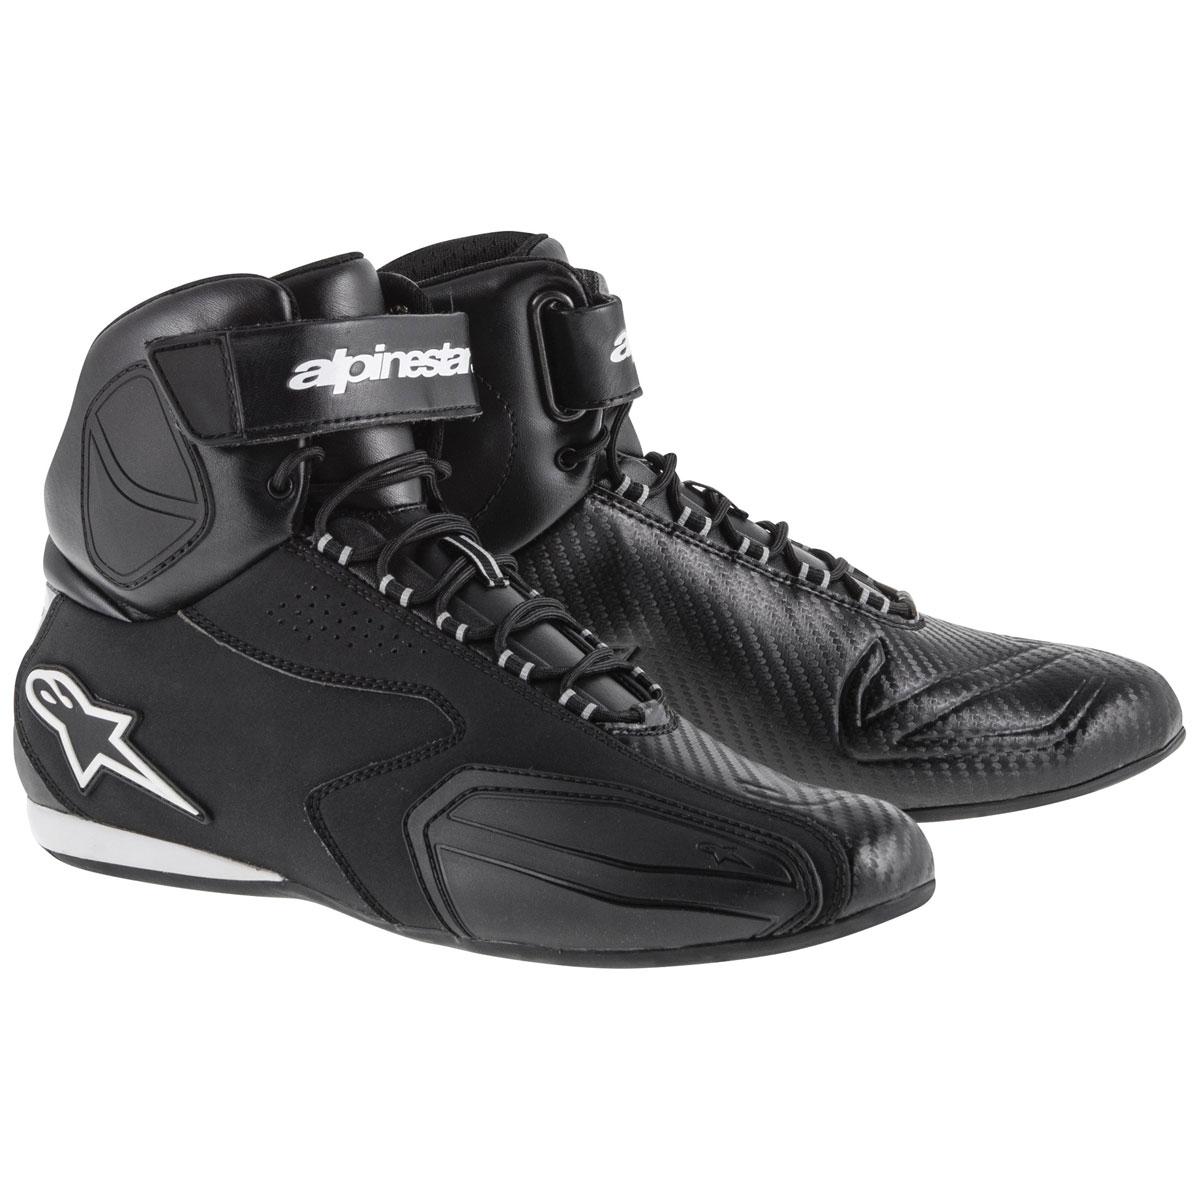 Alpinestars Men's Faster Black Shoes